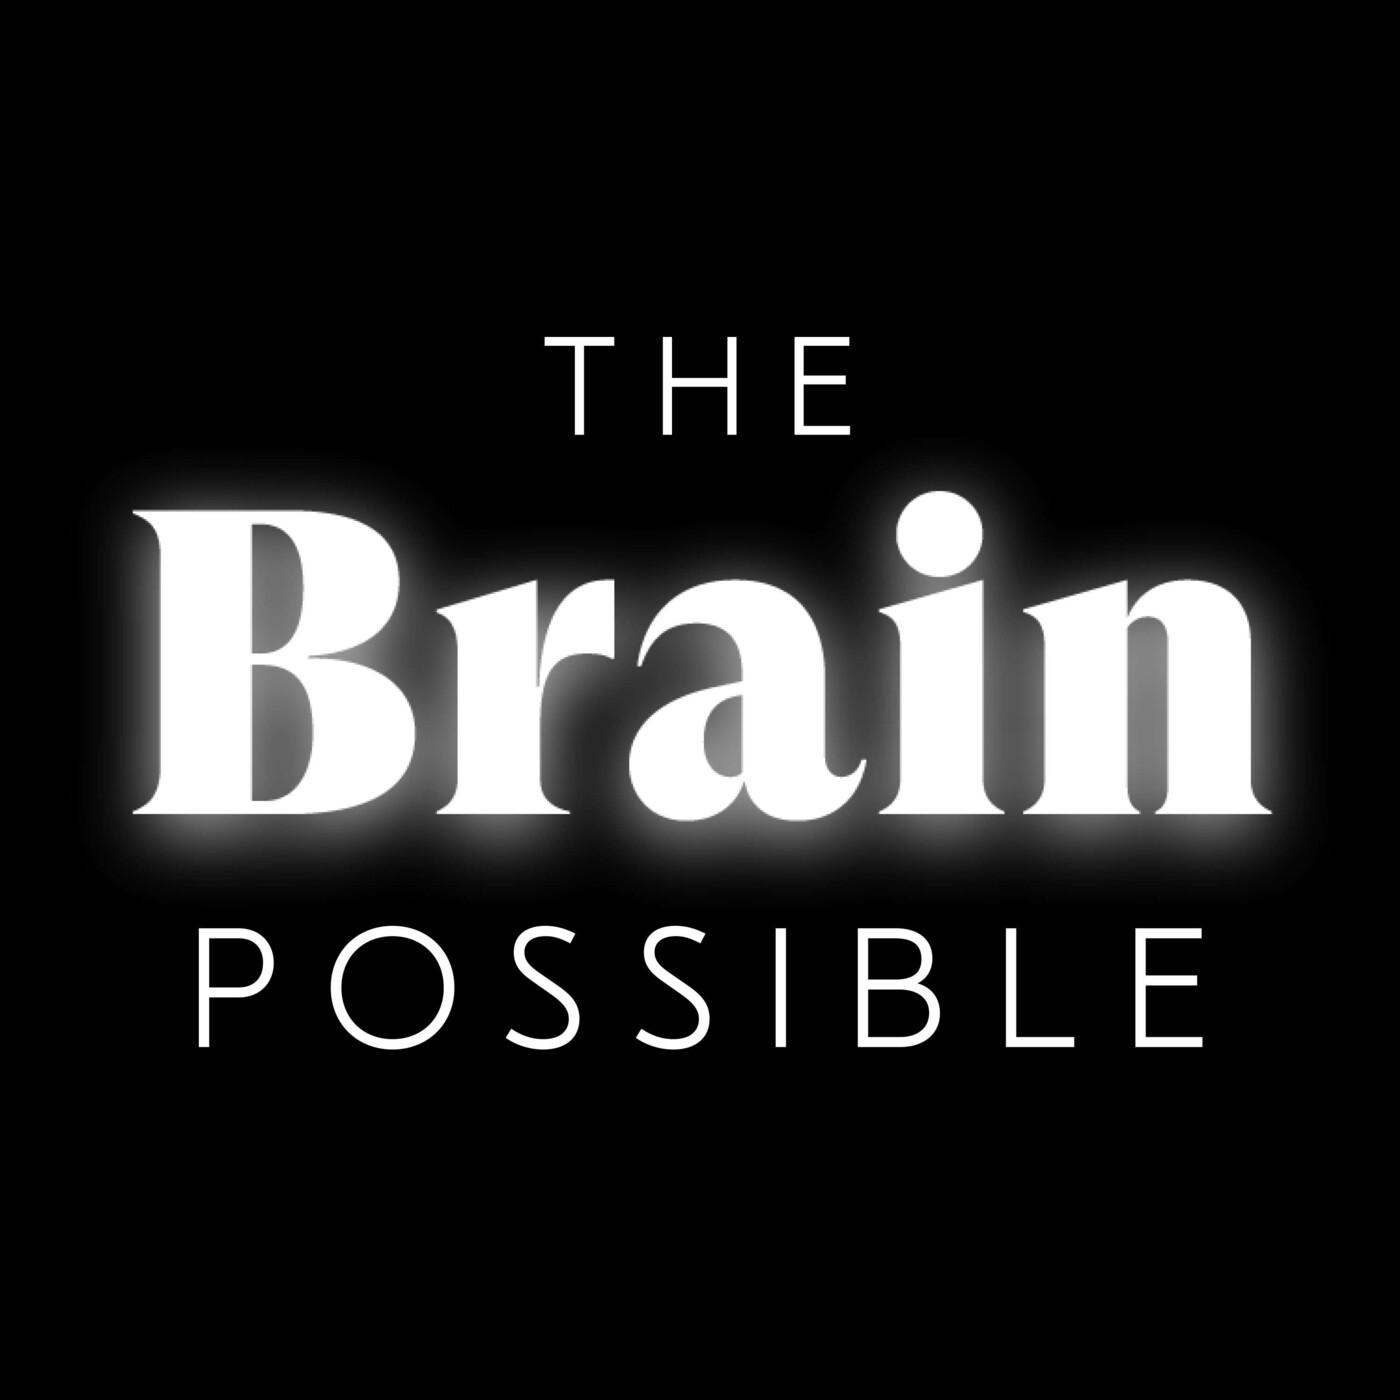 Dr. Barry Gillespie - The Craniosacral Fascial System